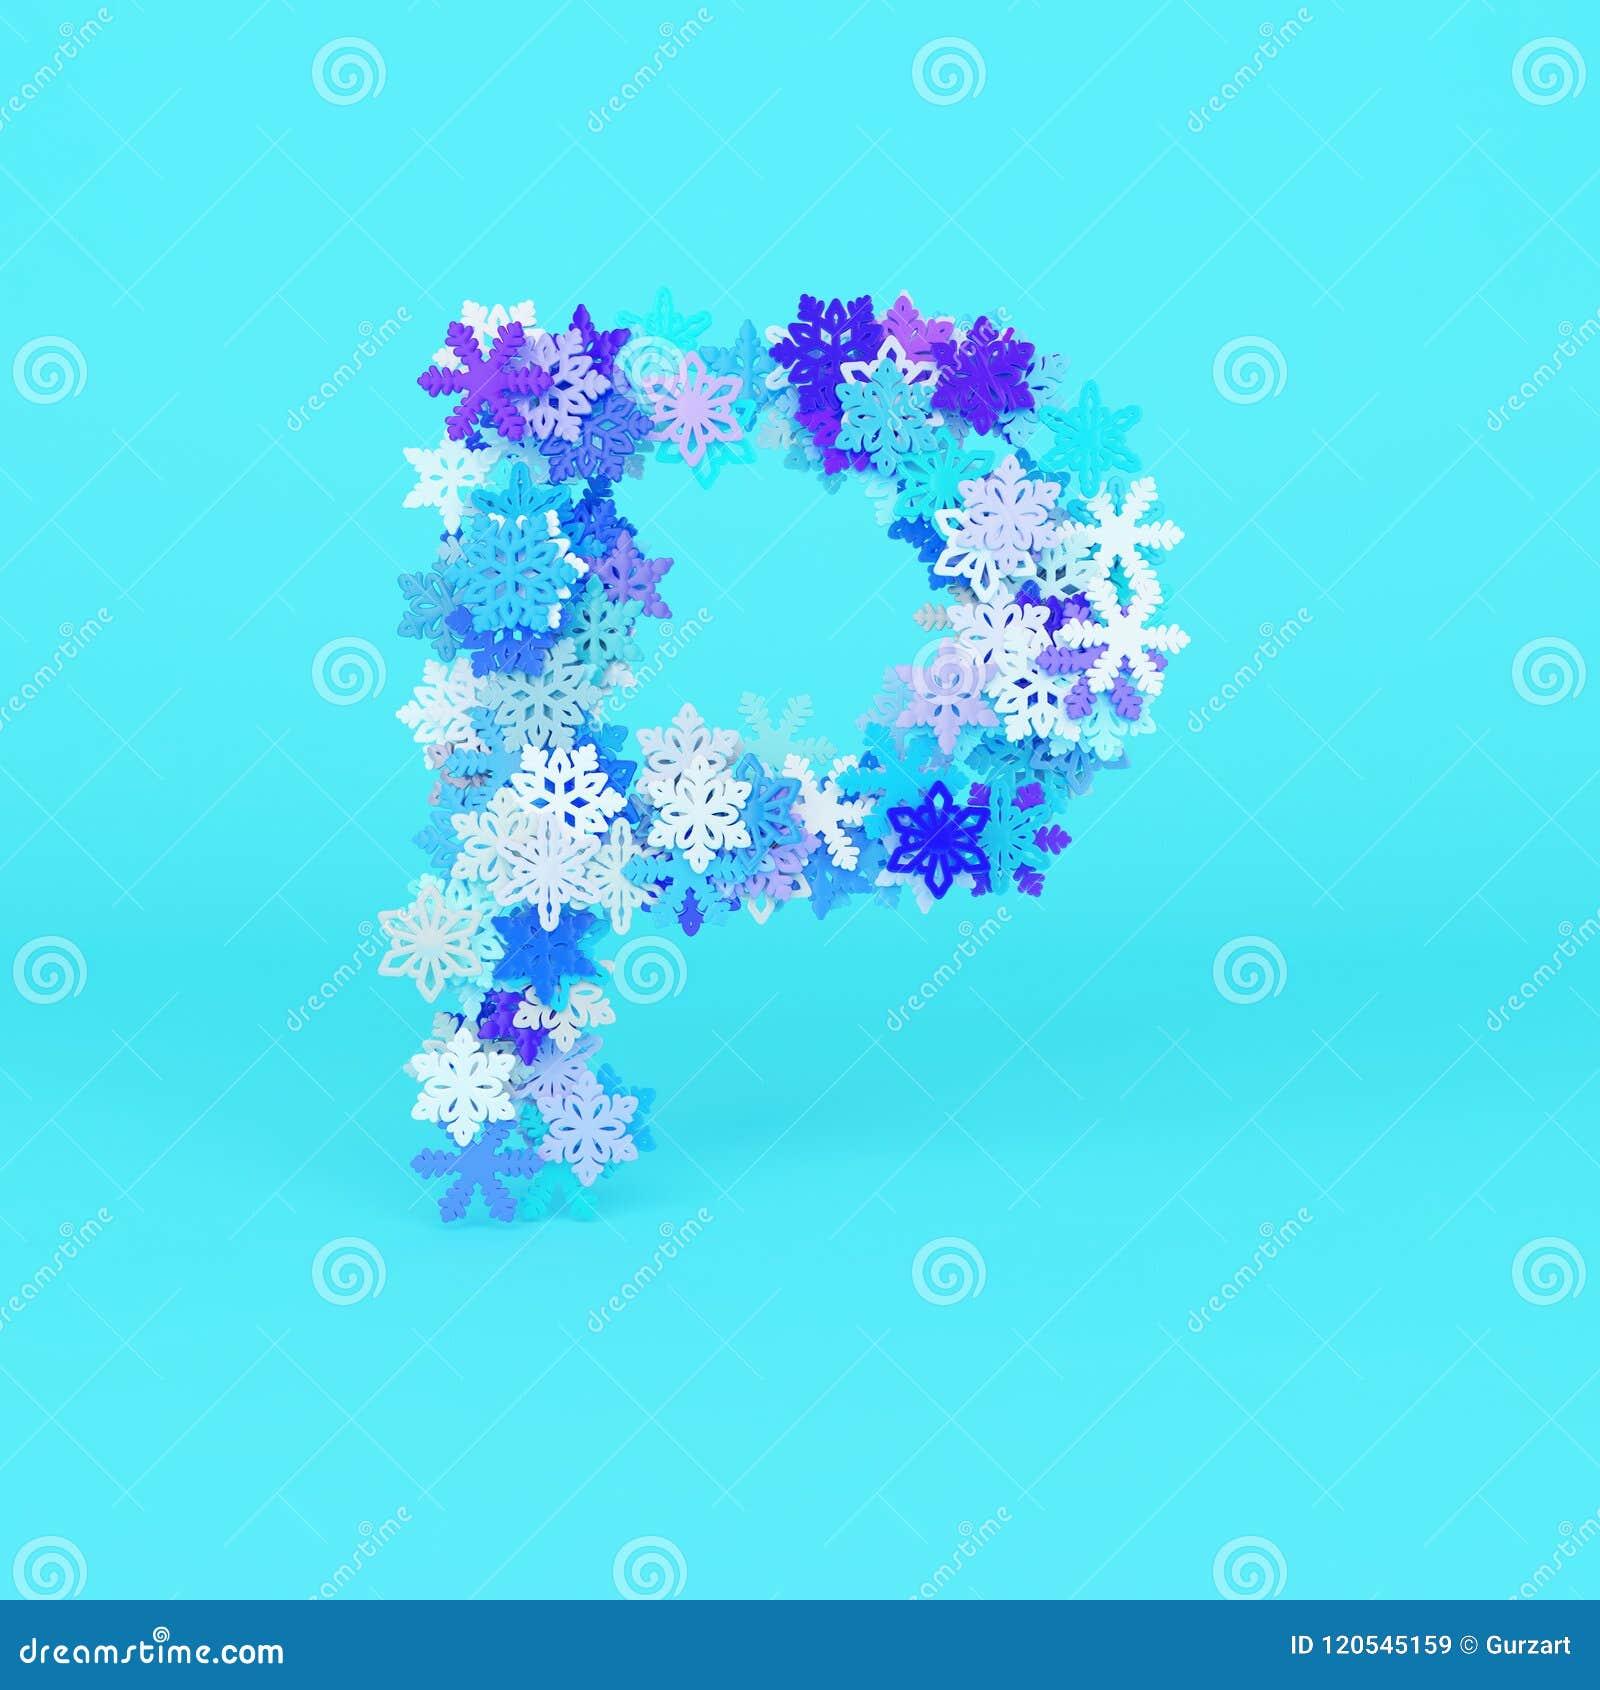 Winter Alphabet Letter P Uppercase Christmas Font Made Of